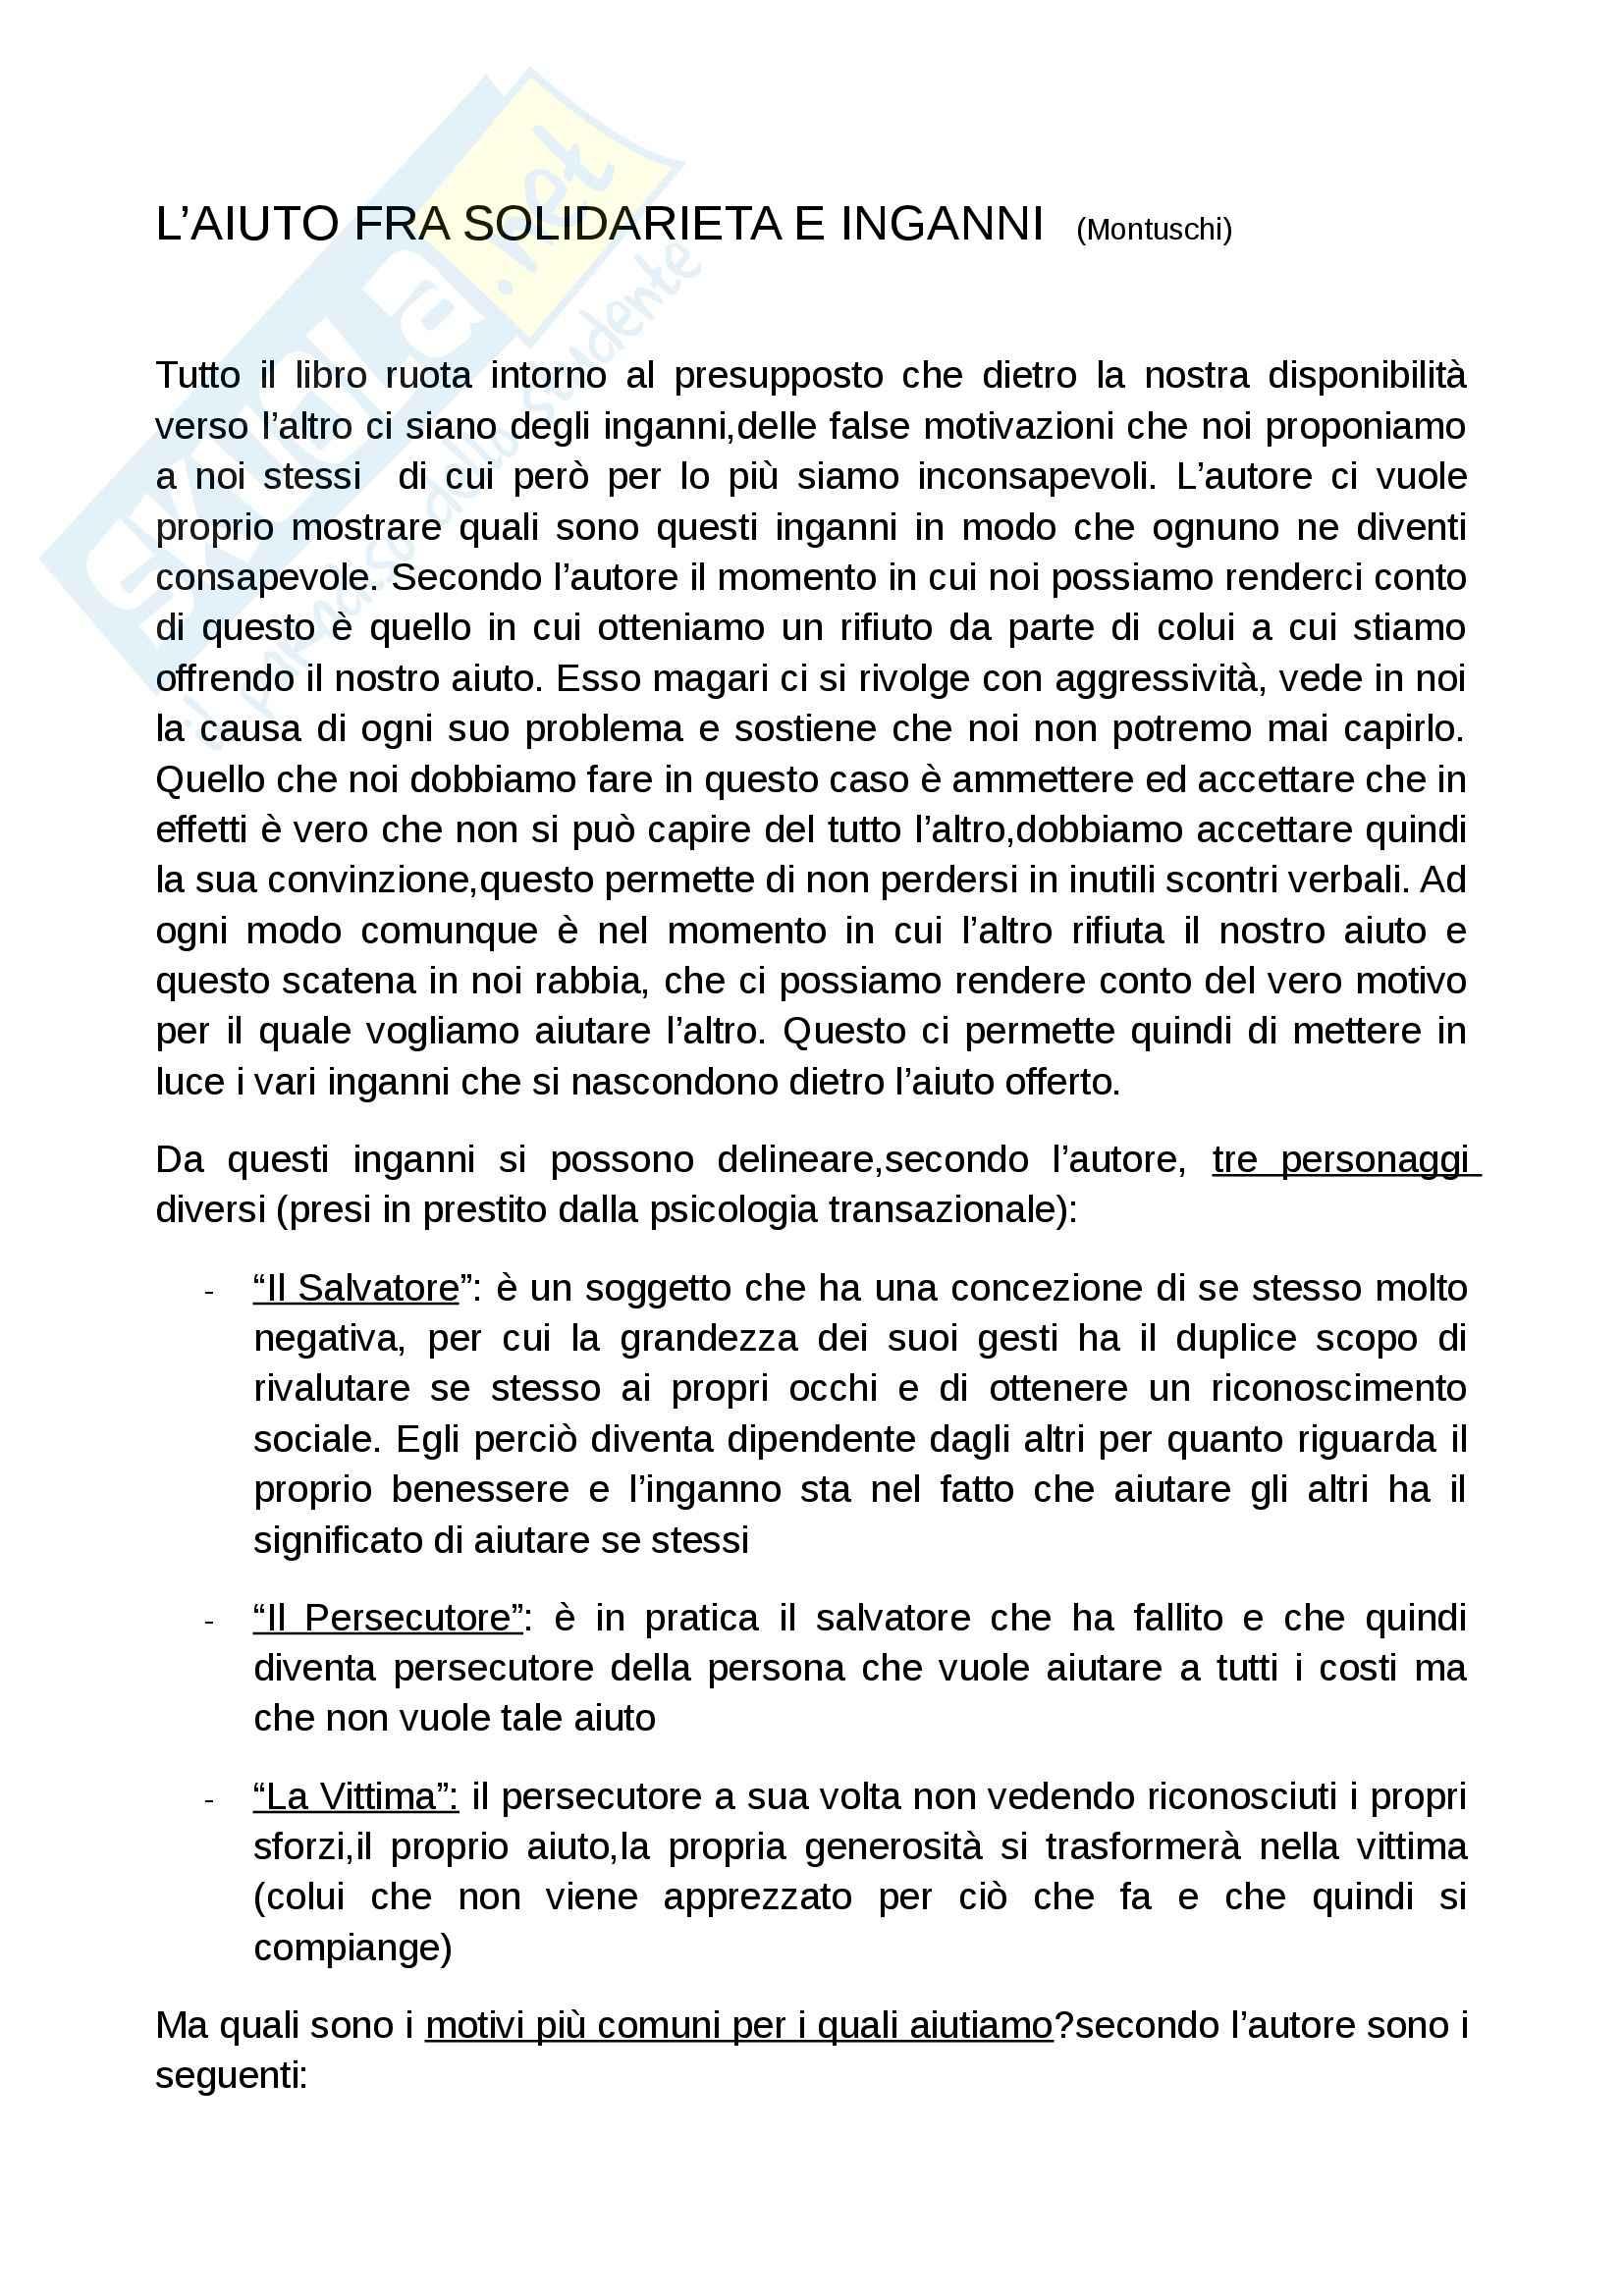 Riassunto esame Pedagogia speciale, prof. Grasselli, libro consigliato L'aiuto fra solidarietà ed inganni, Montuschi